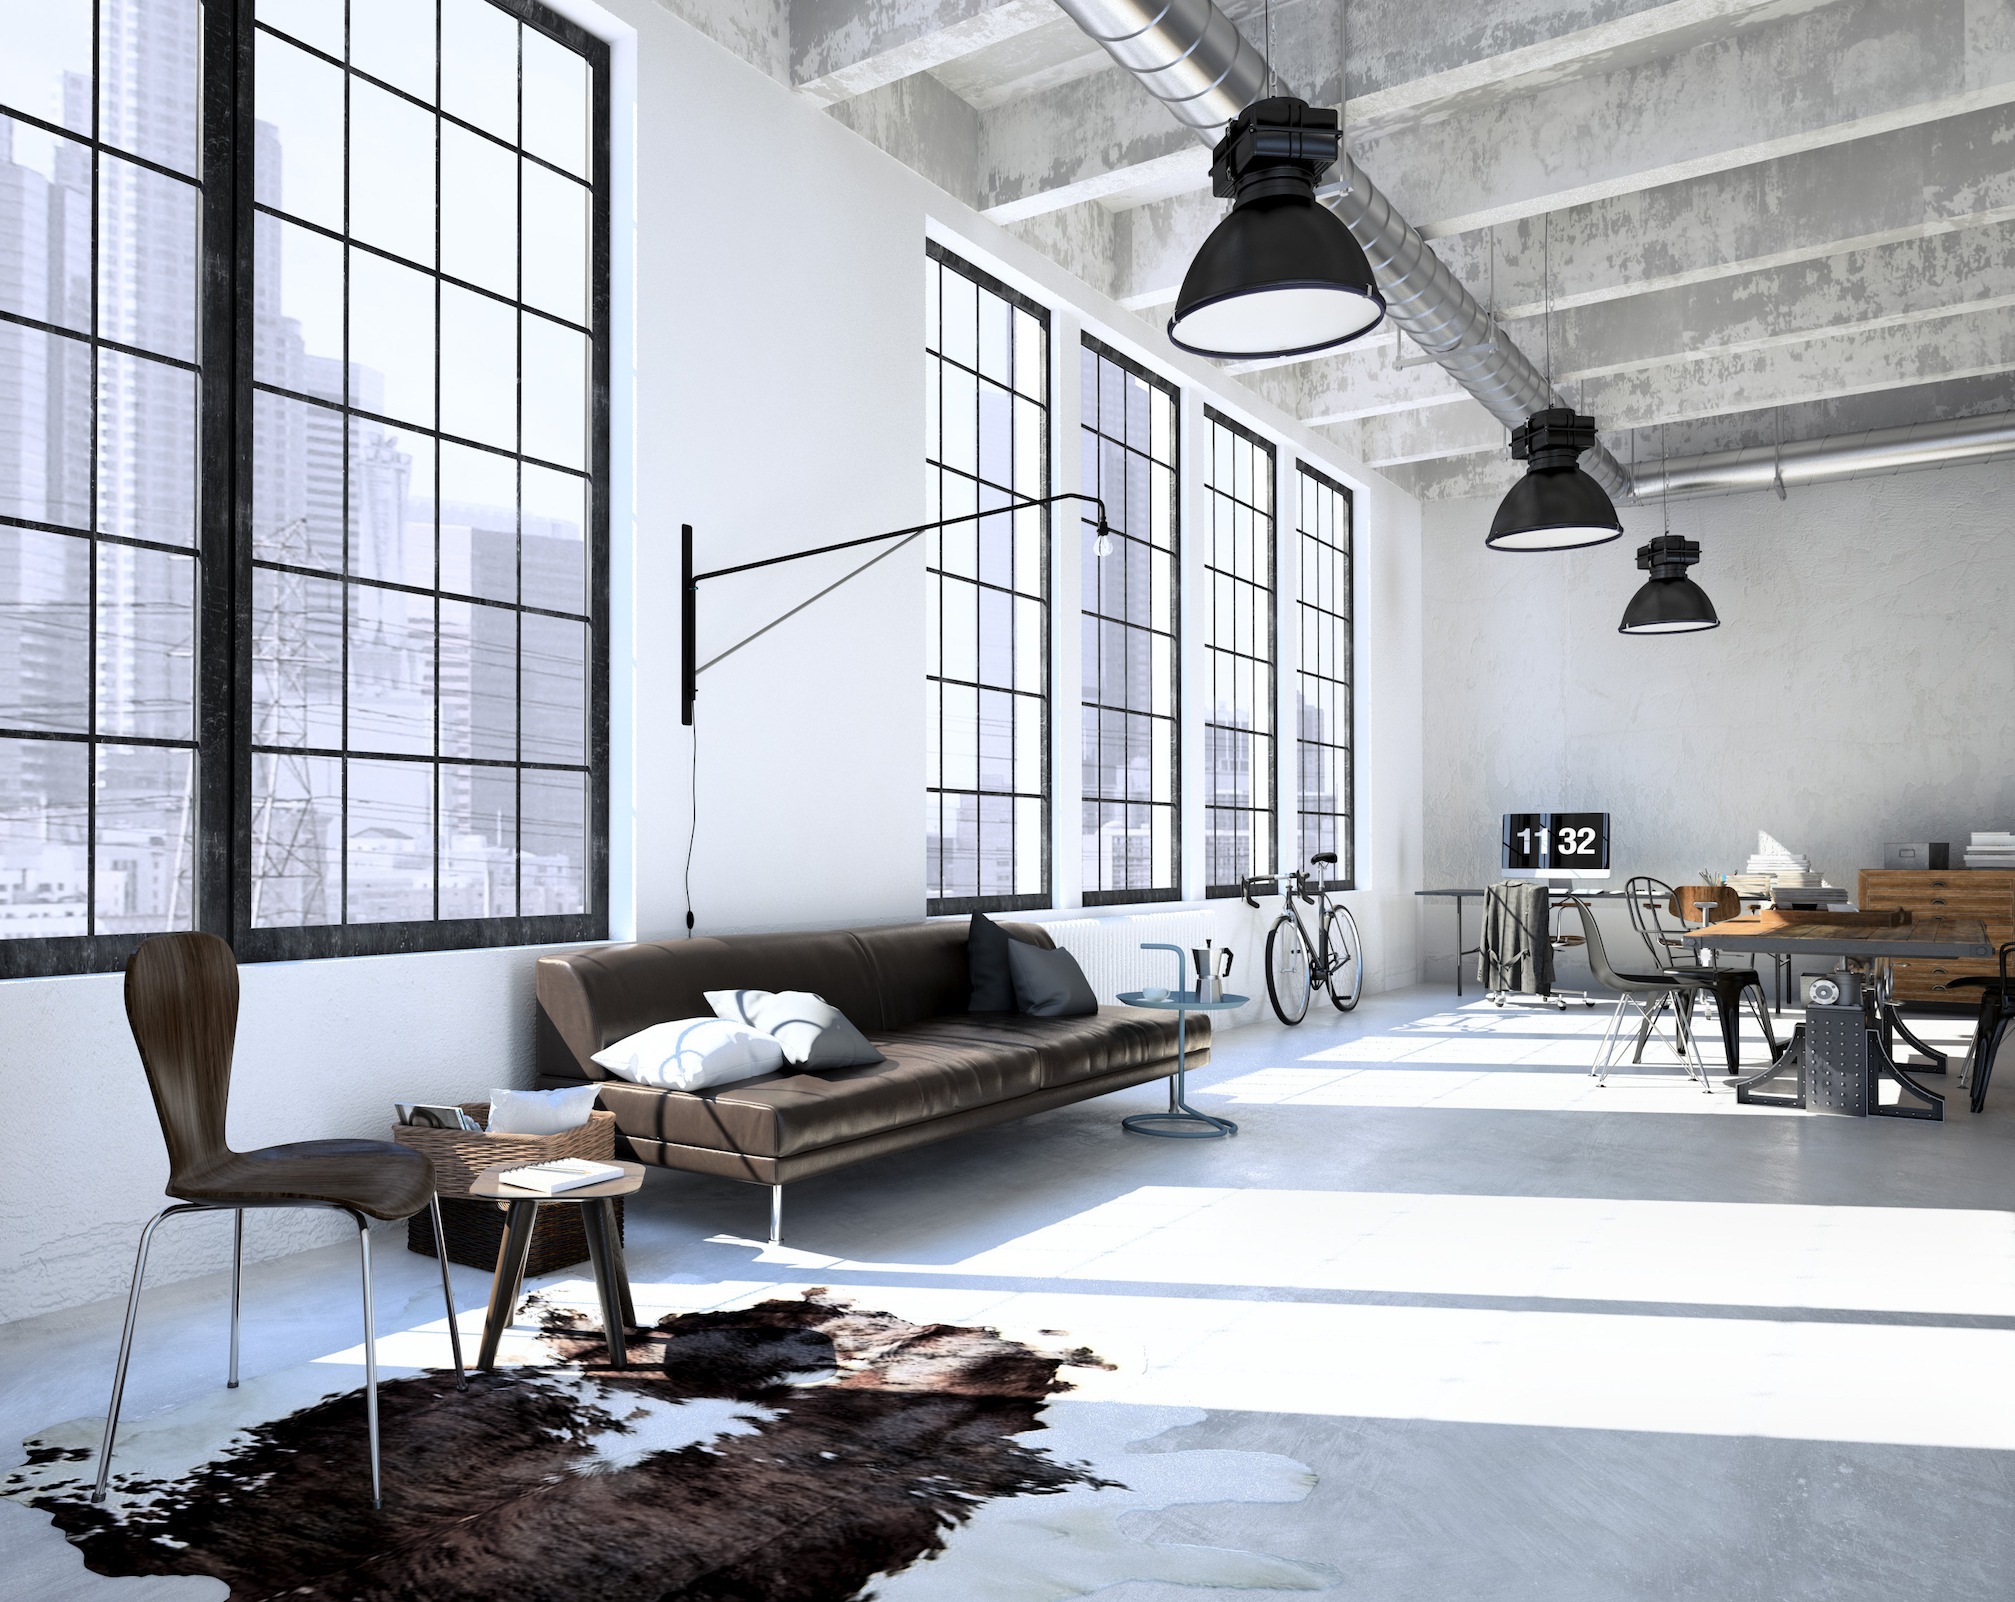 Industrial modern loft